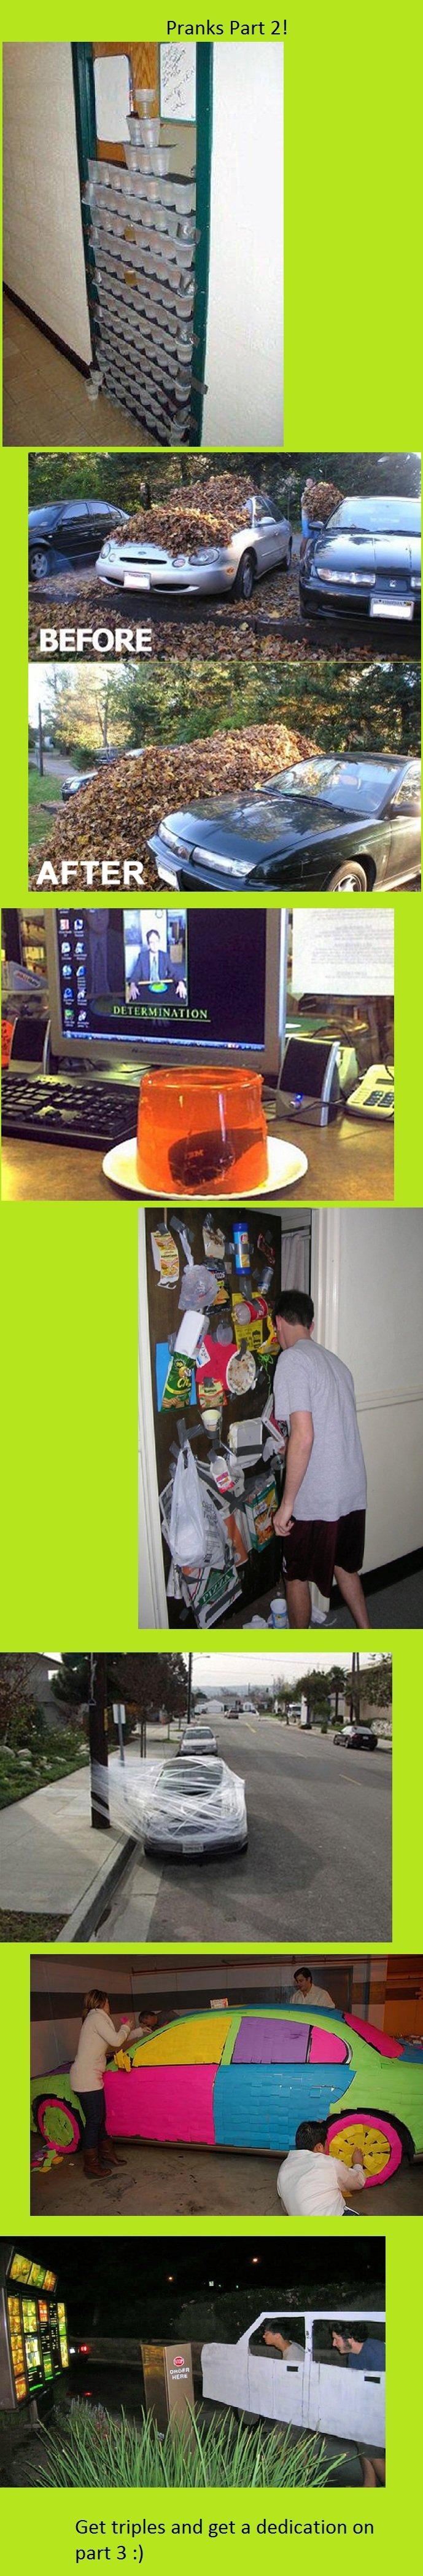 Pranks part 2. part 3 funnyjunk.com/funny_pictures/2270631/prank+3/ psrt 4 funnyjunk.com/funny_pictures/2272937/Prank+4/. Pranks Part 2! Get triples and get a d